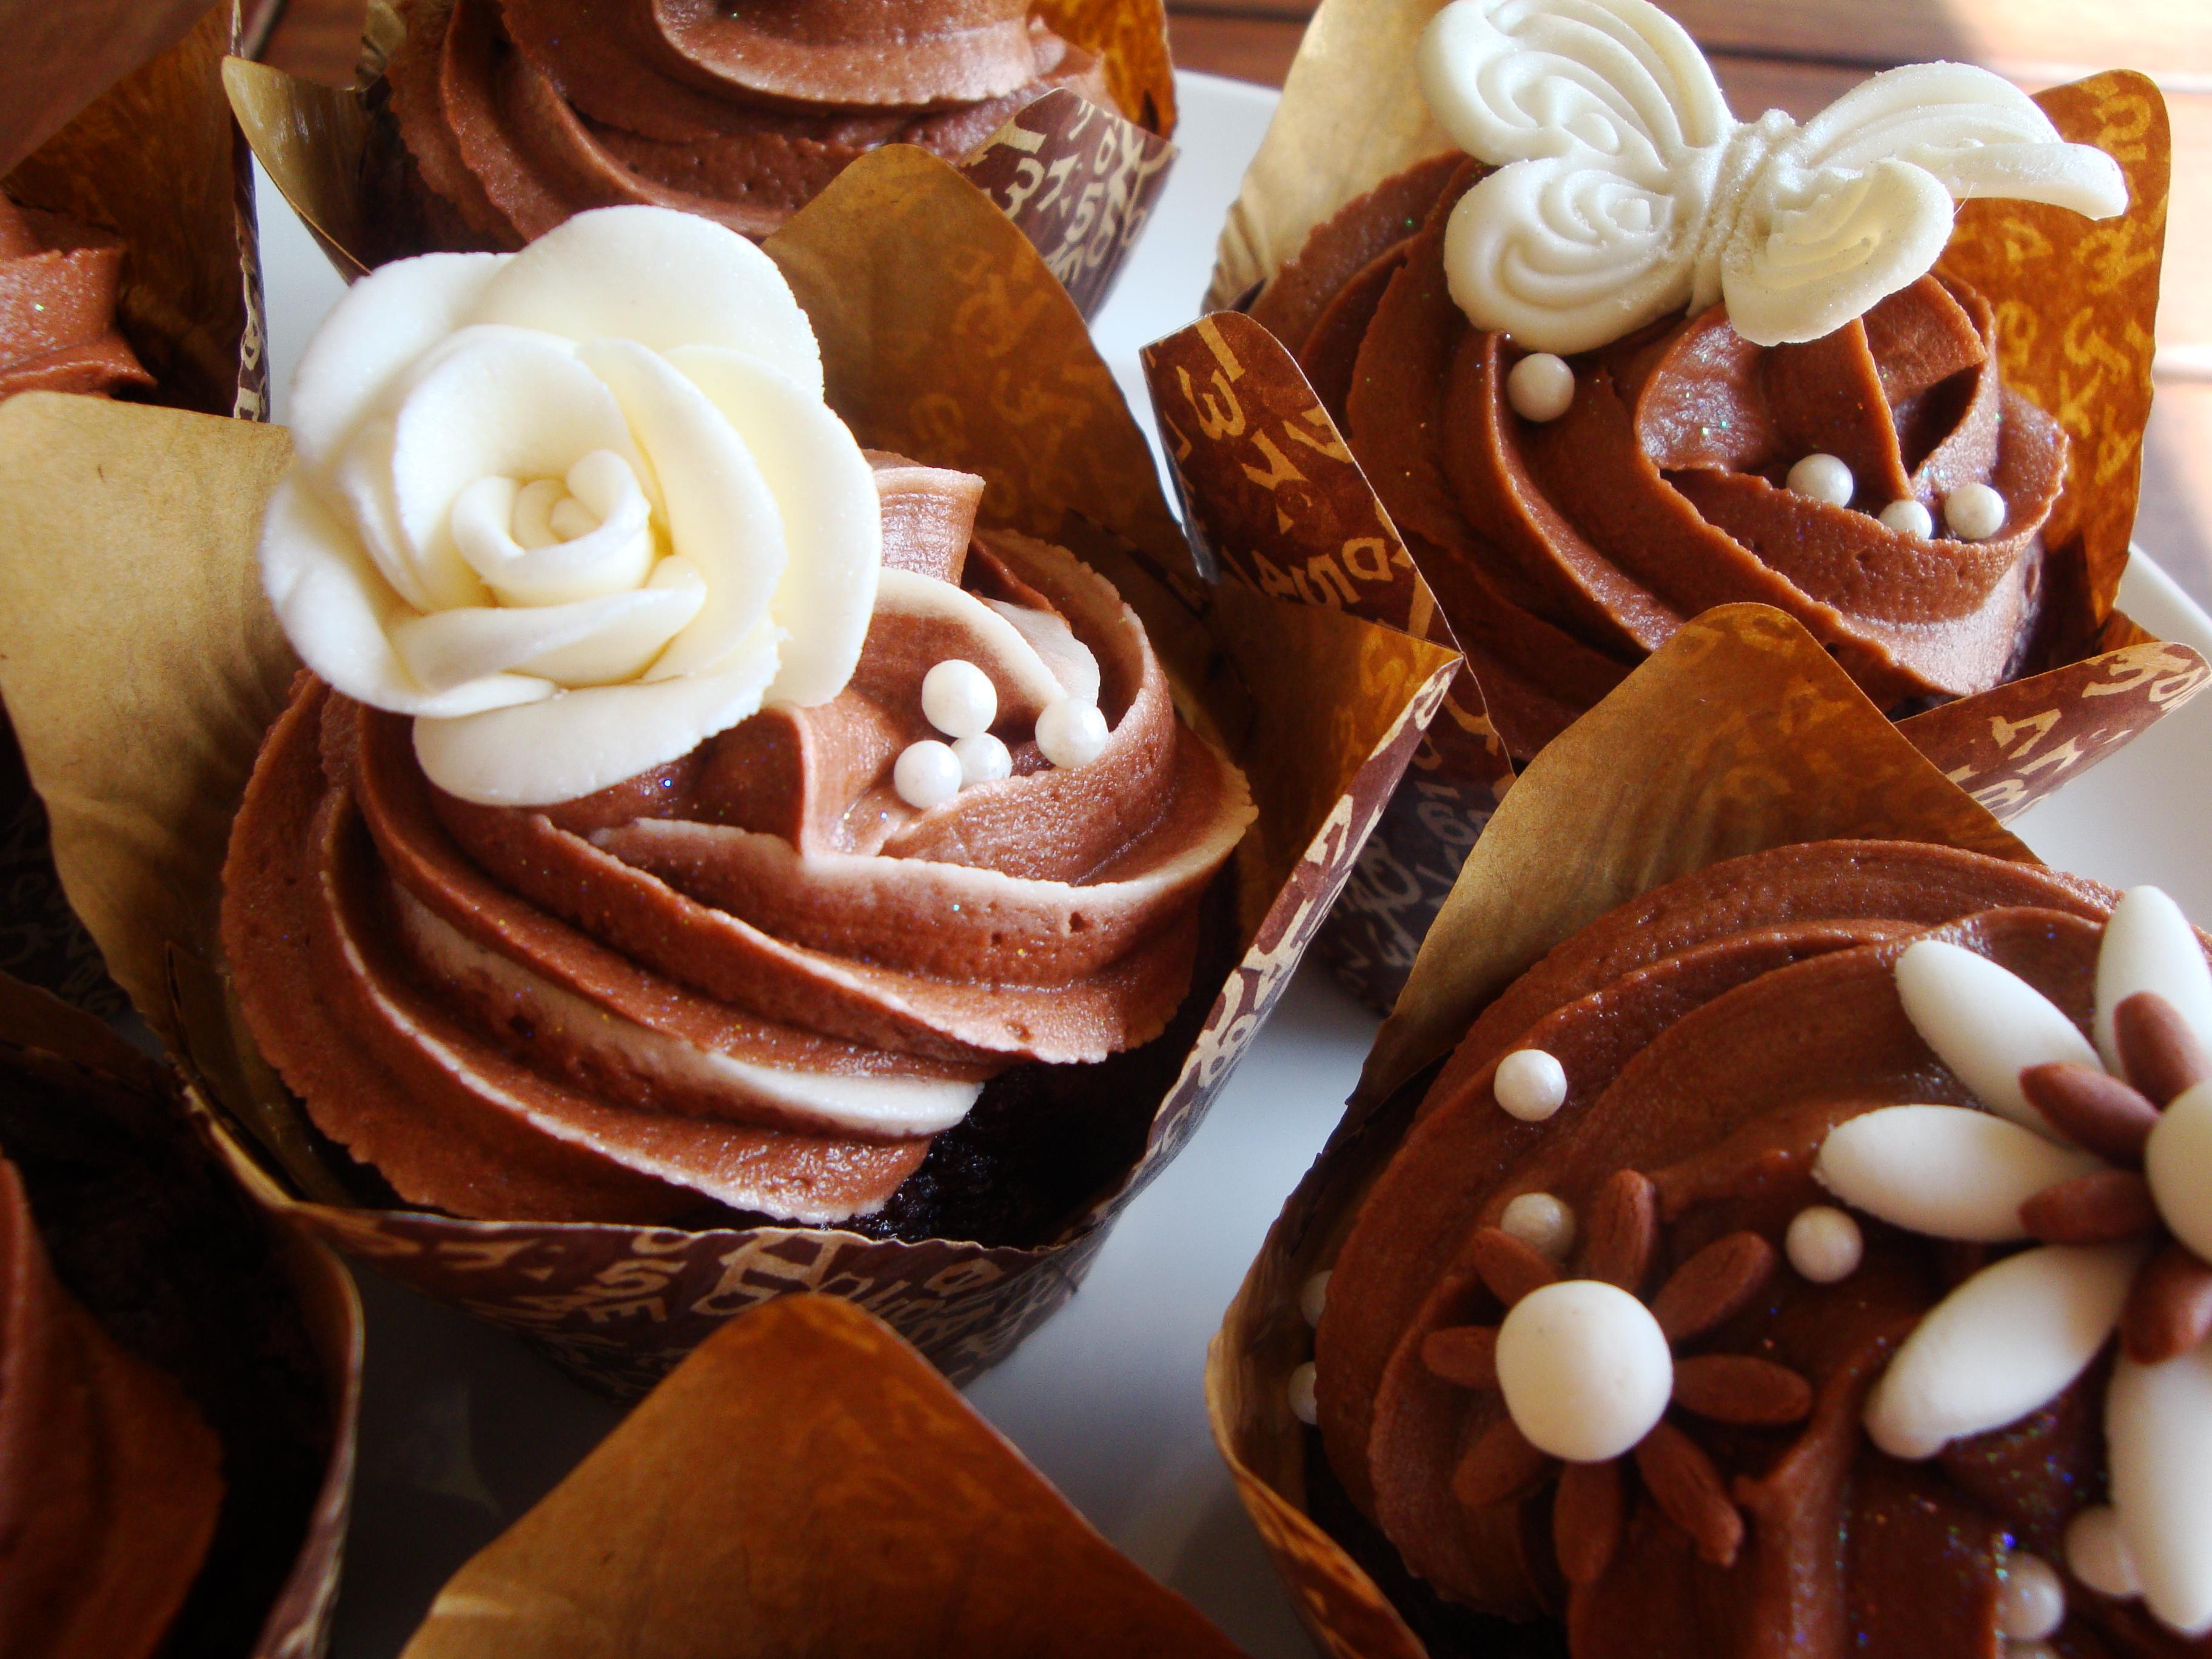 Wedding Cupcakes – cream & chocolate | cupcakes2delite